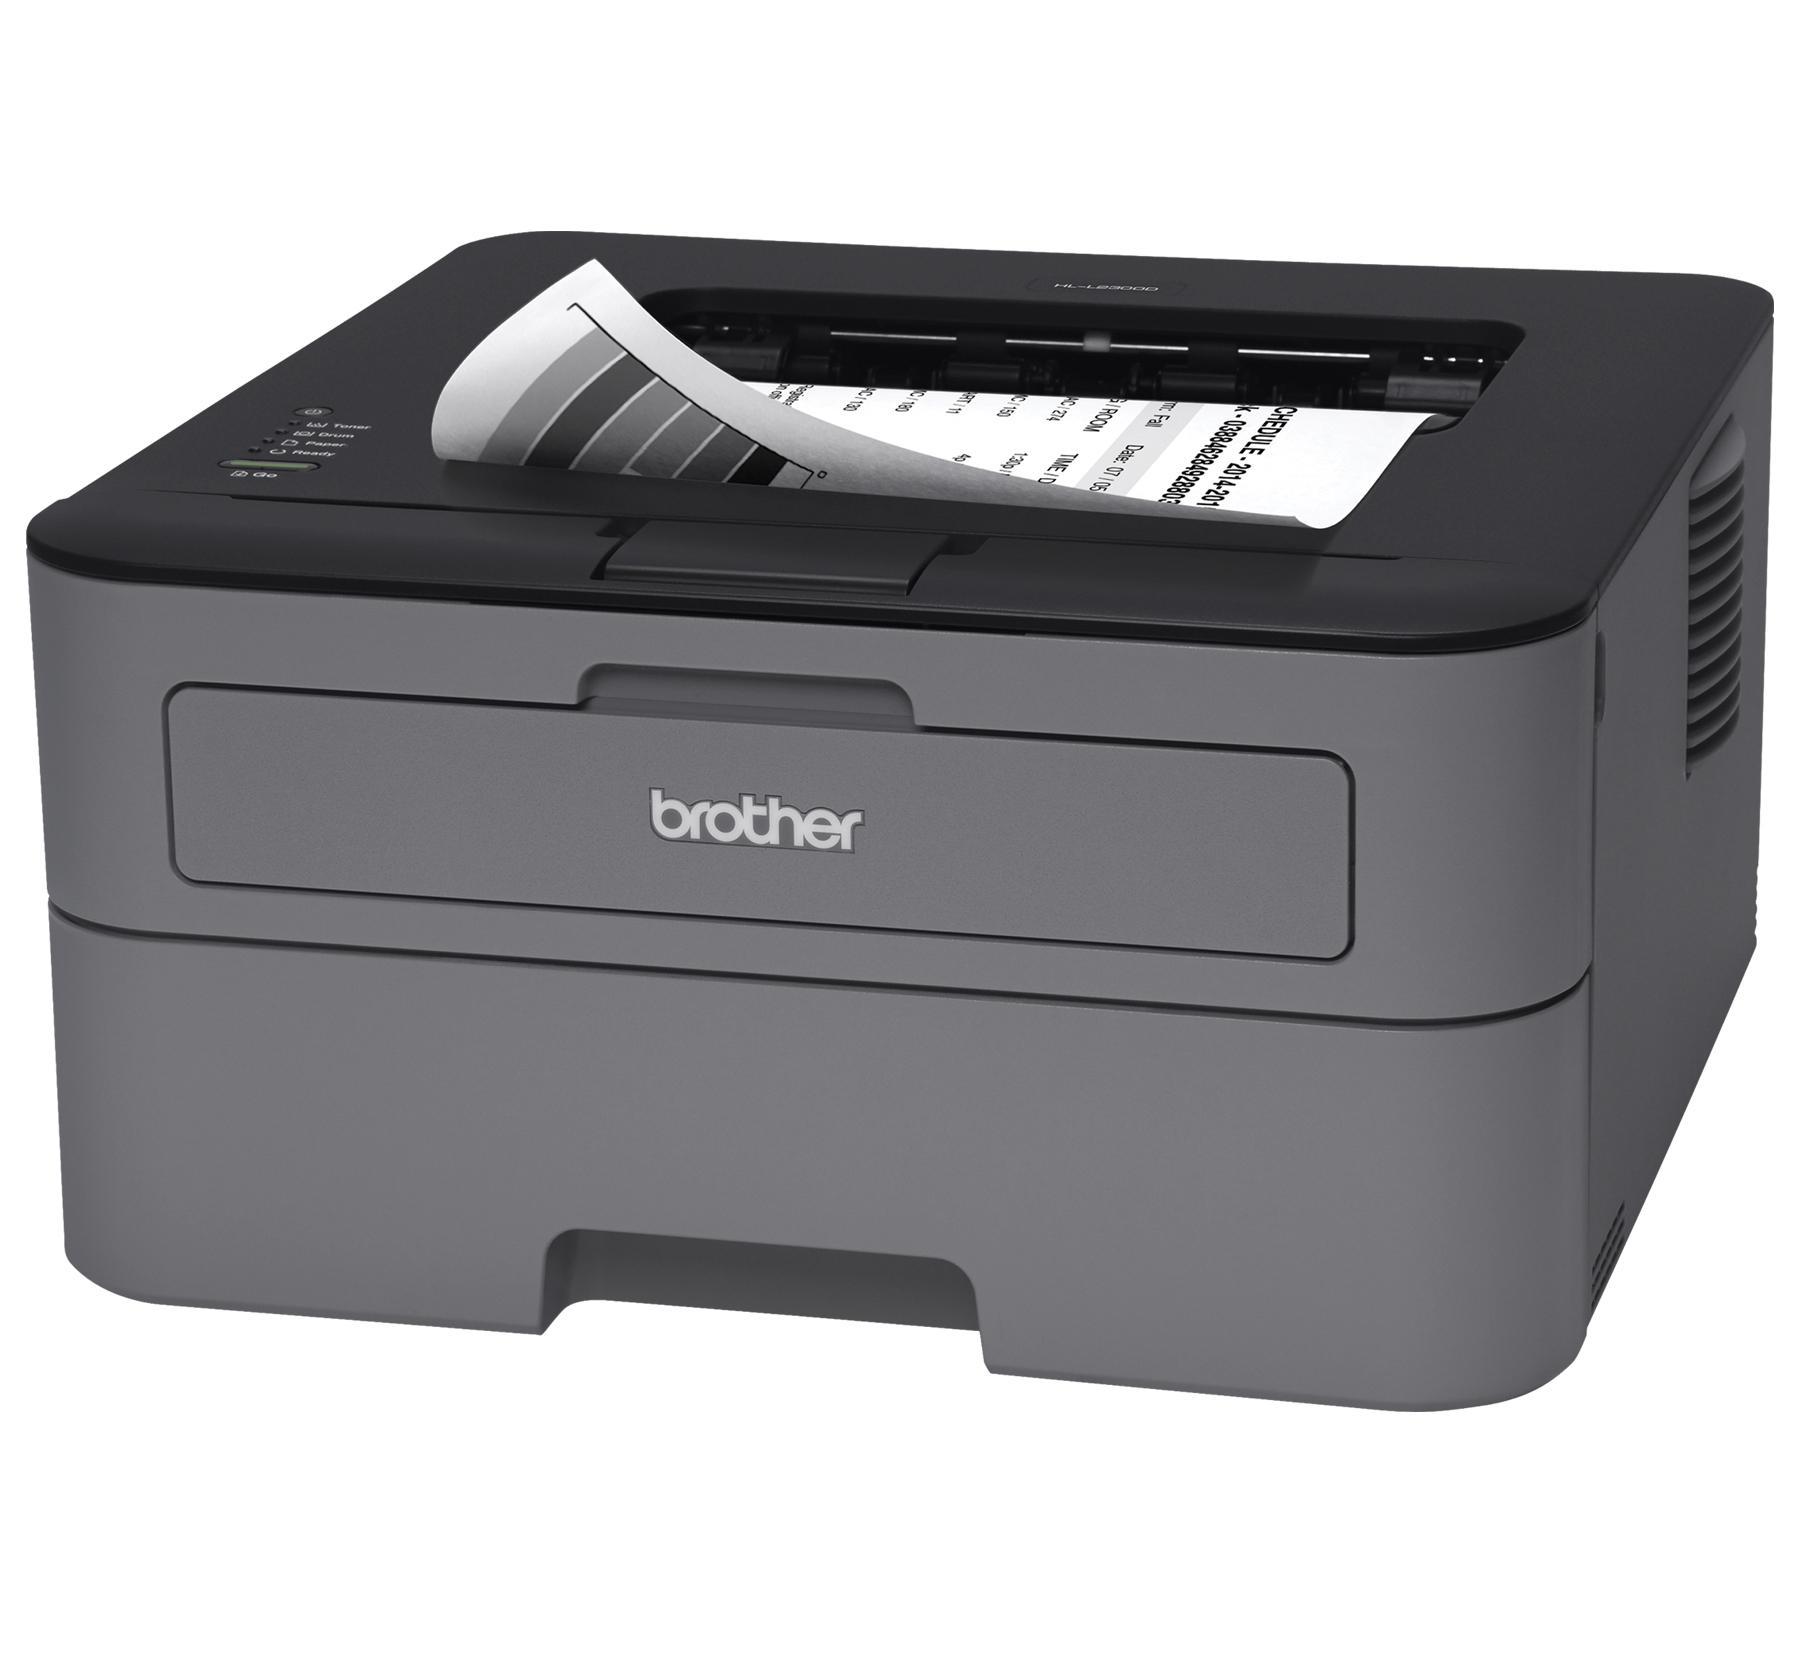 Technolux.bg | Laser monochrome printers